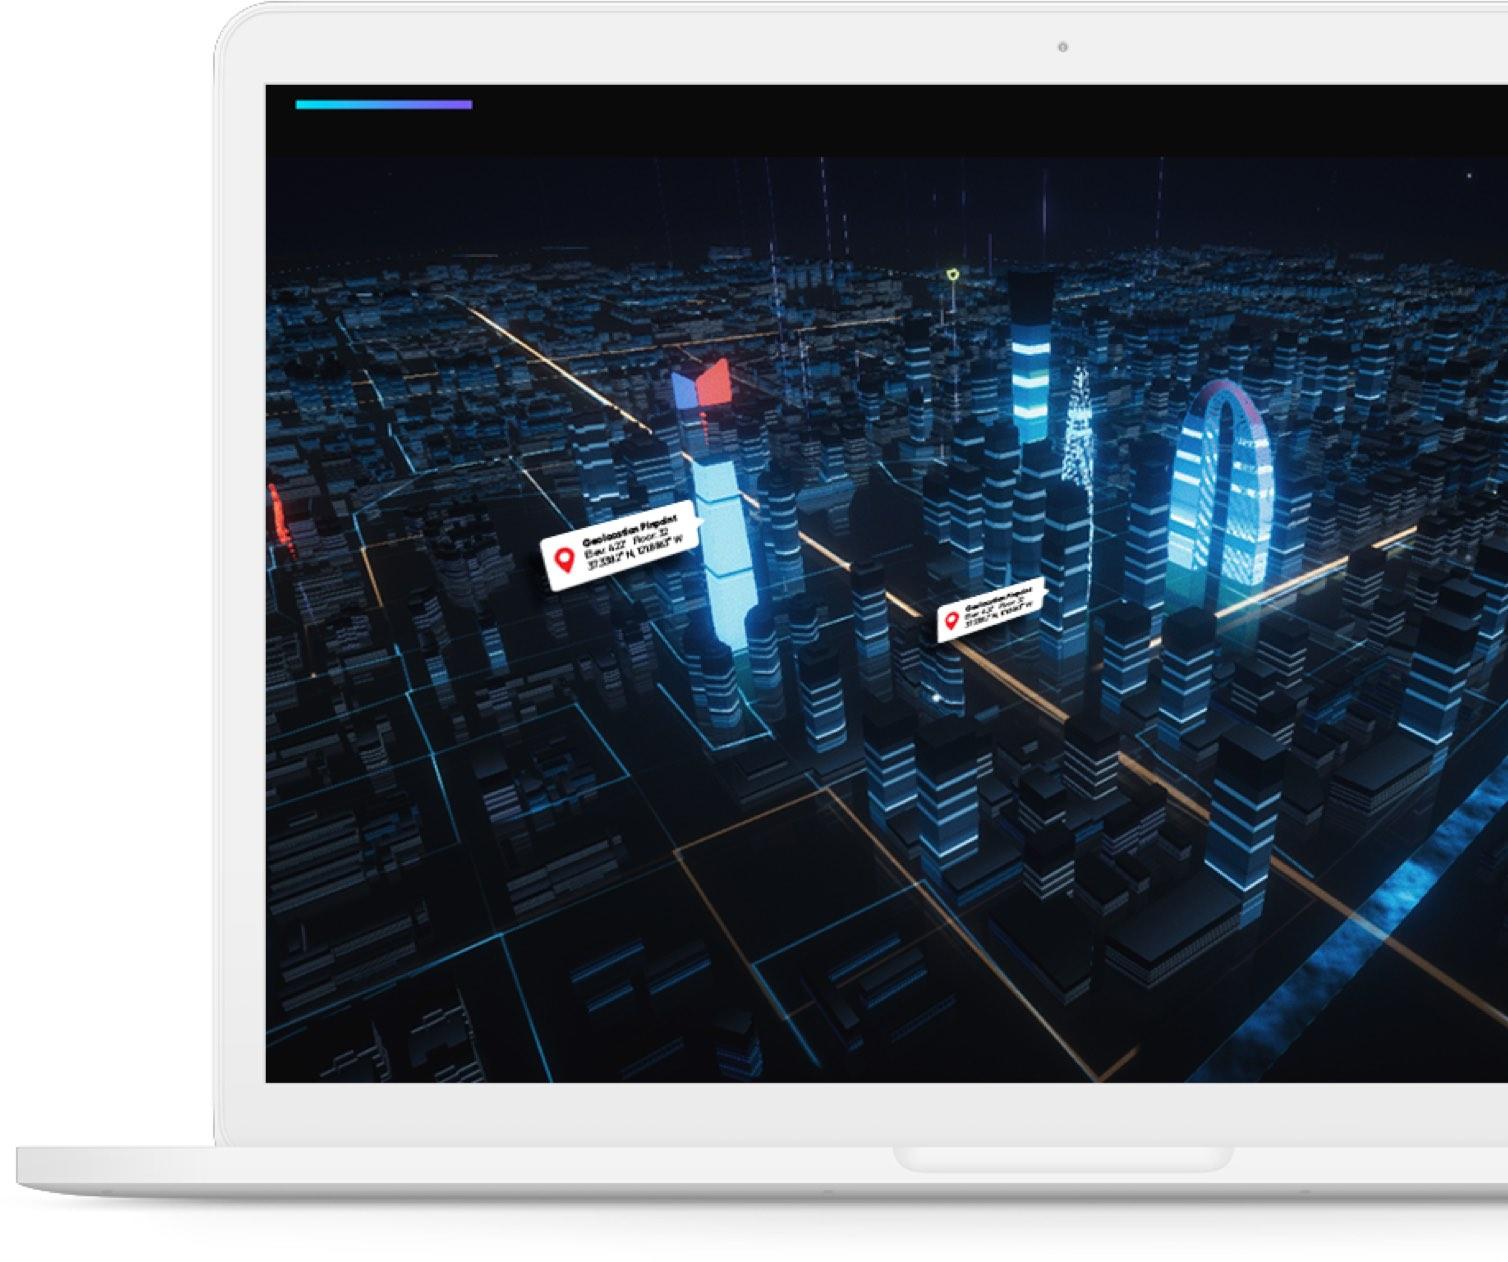 NextNav technology is the future of GPS